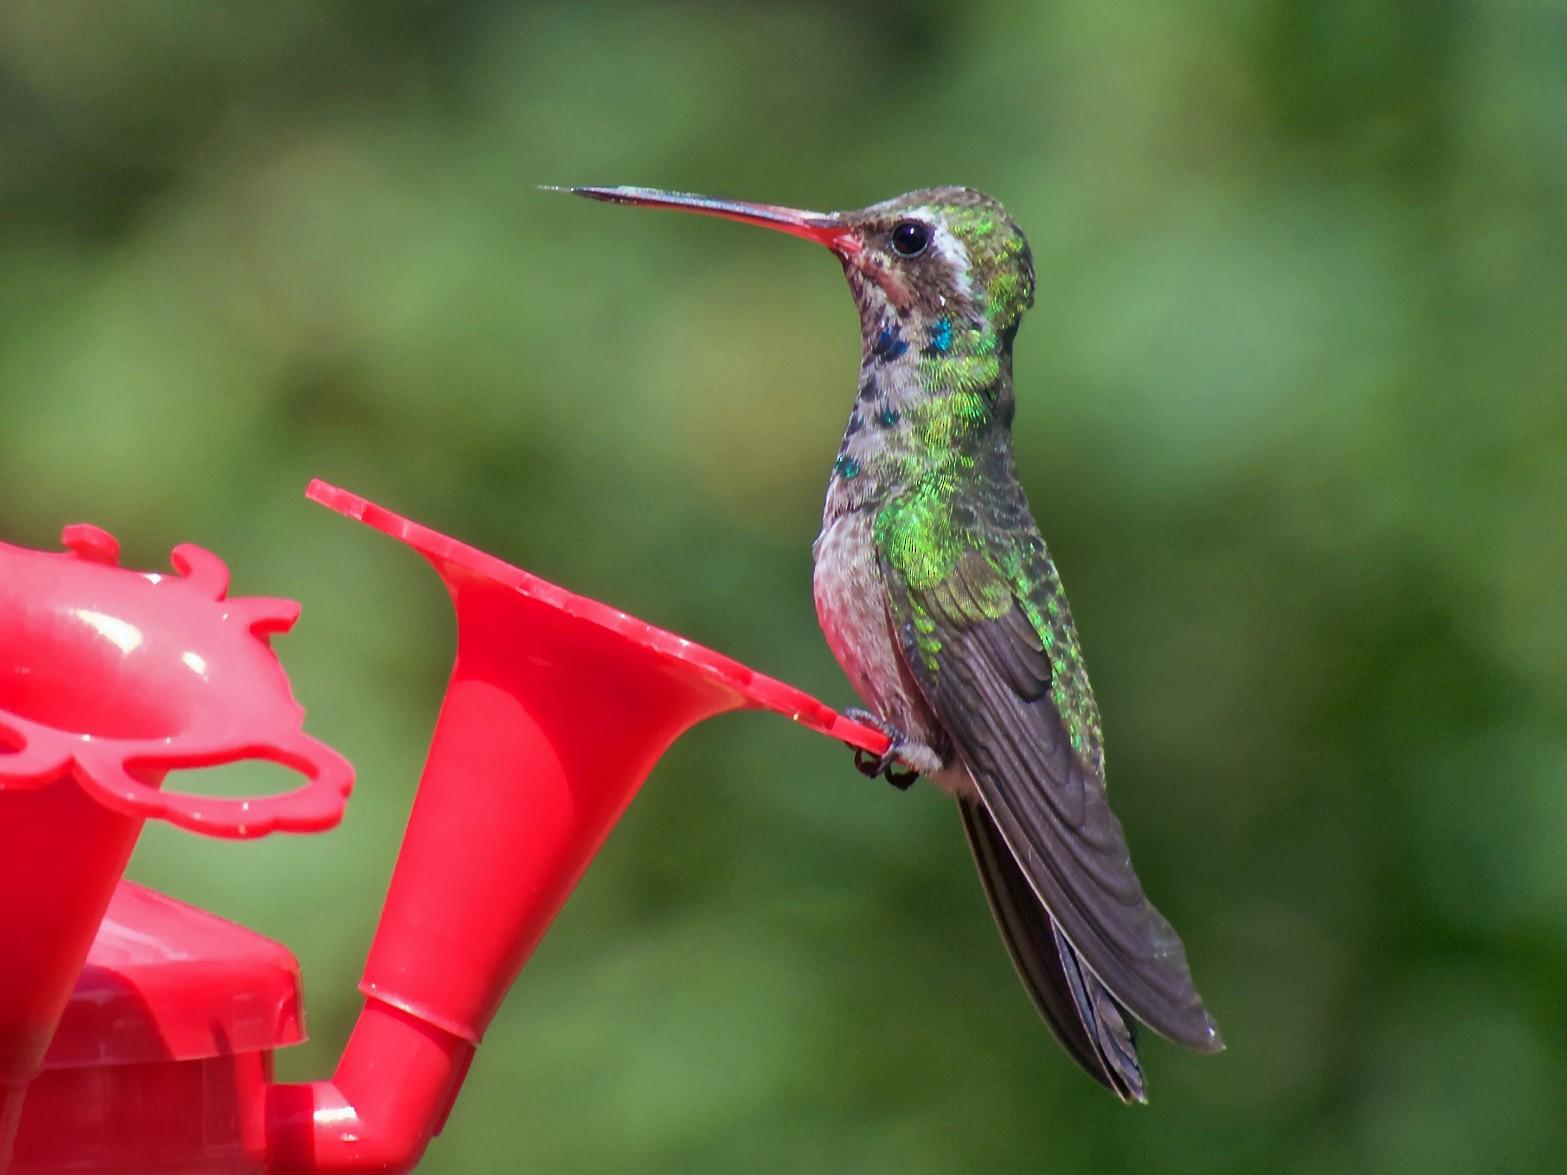 Broad-billed Hummingbird - Danny Tipton